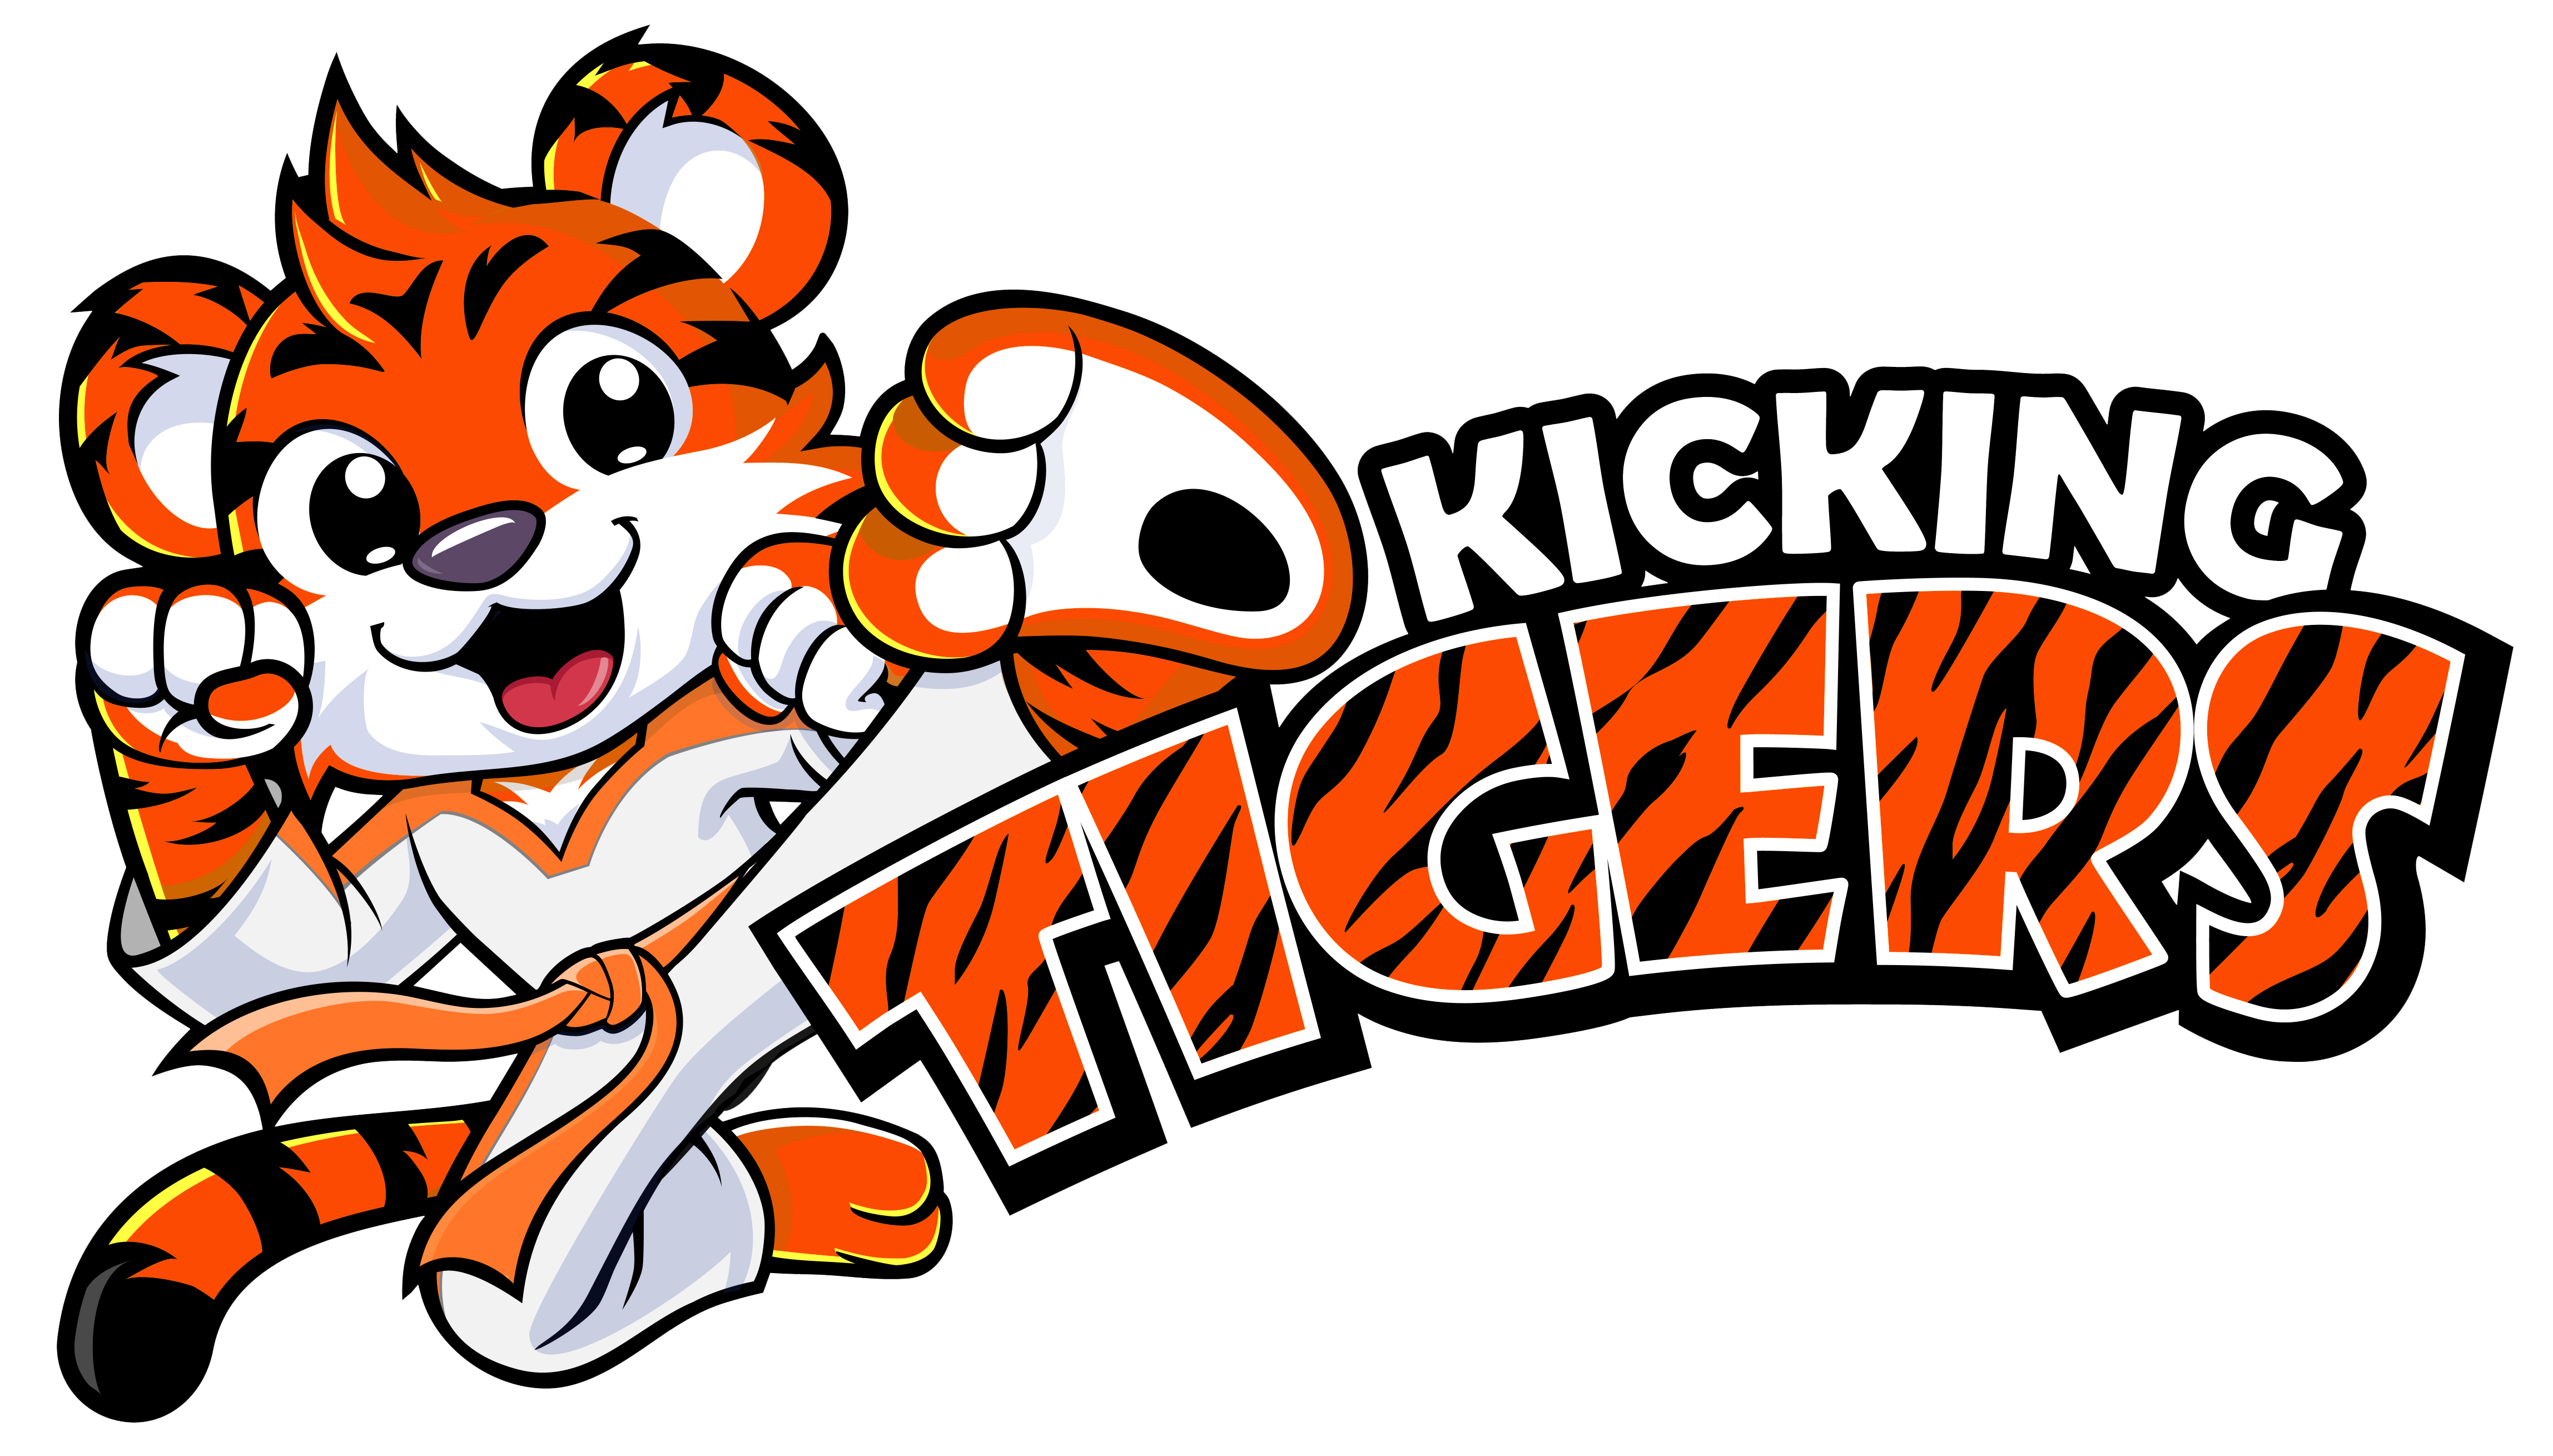 Kicking Tigers